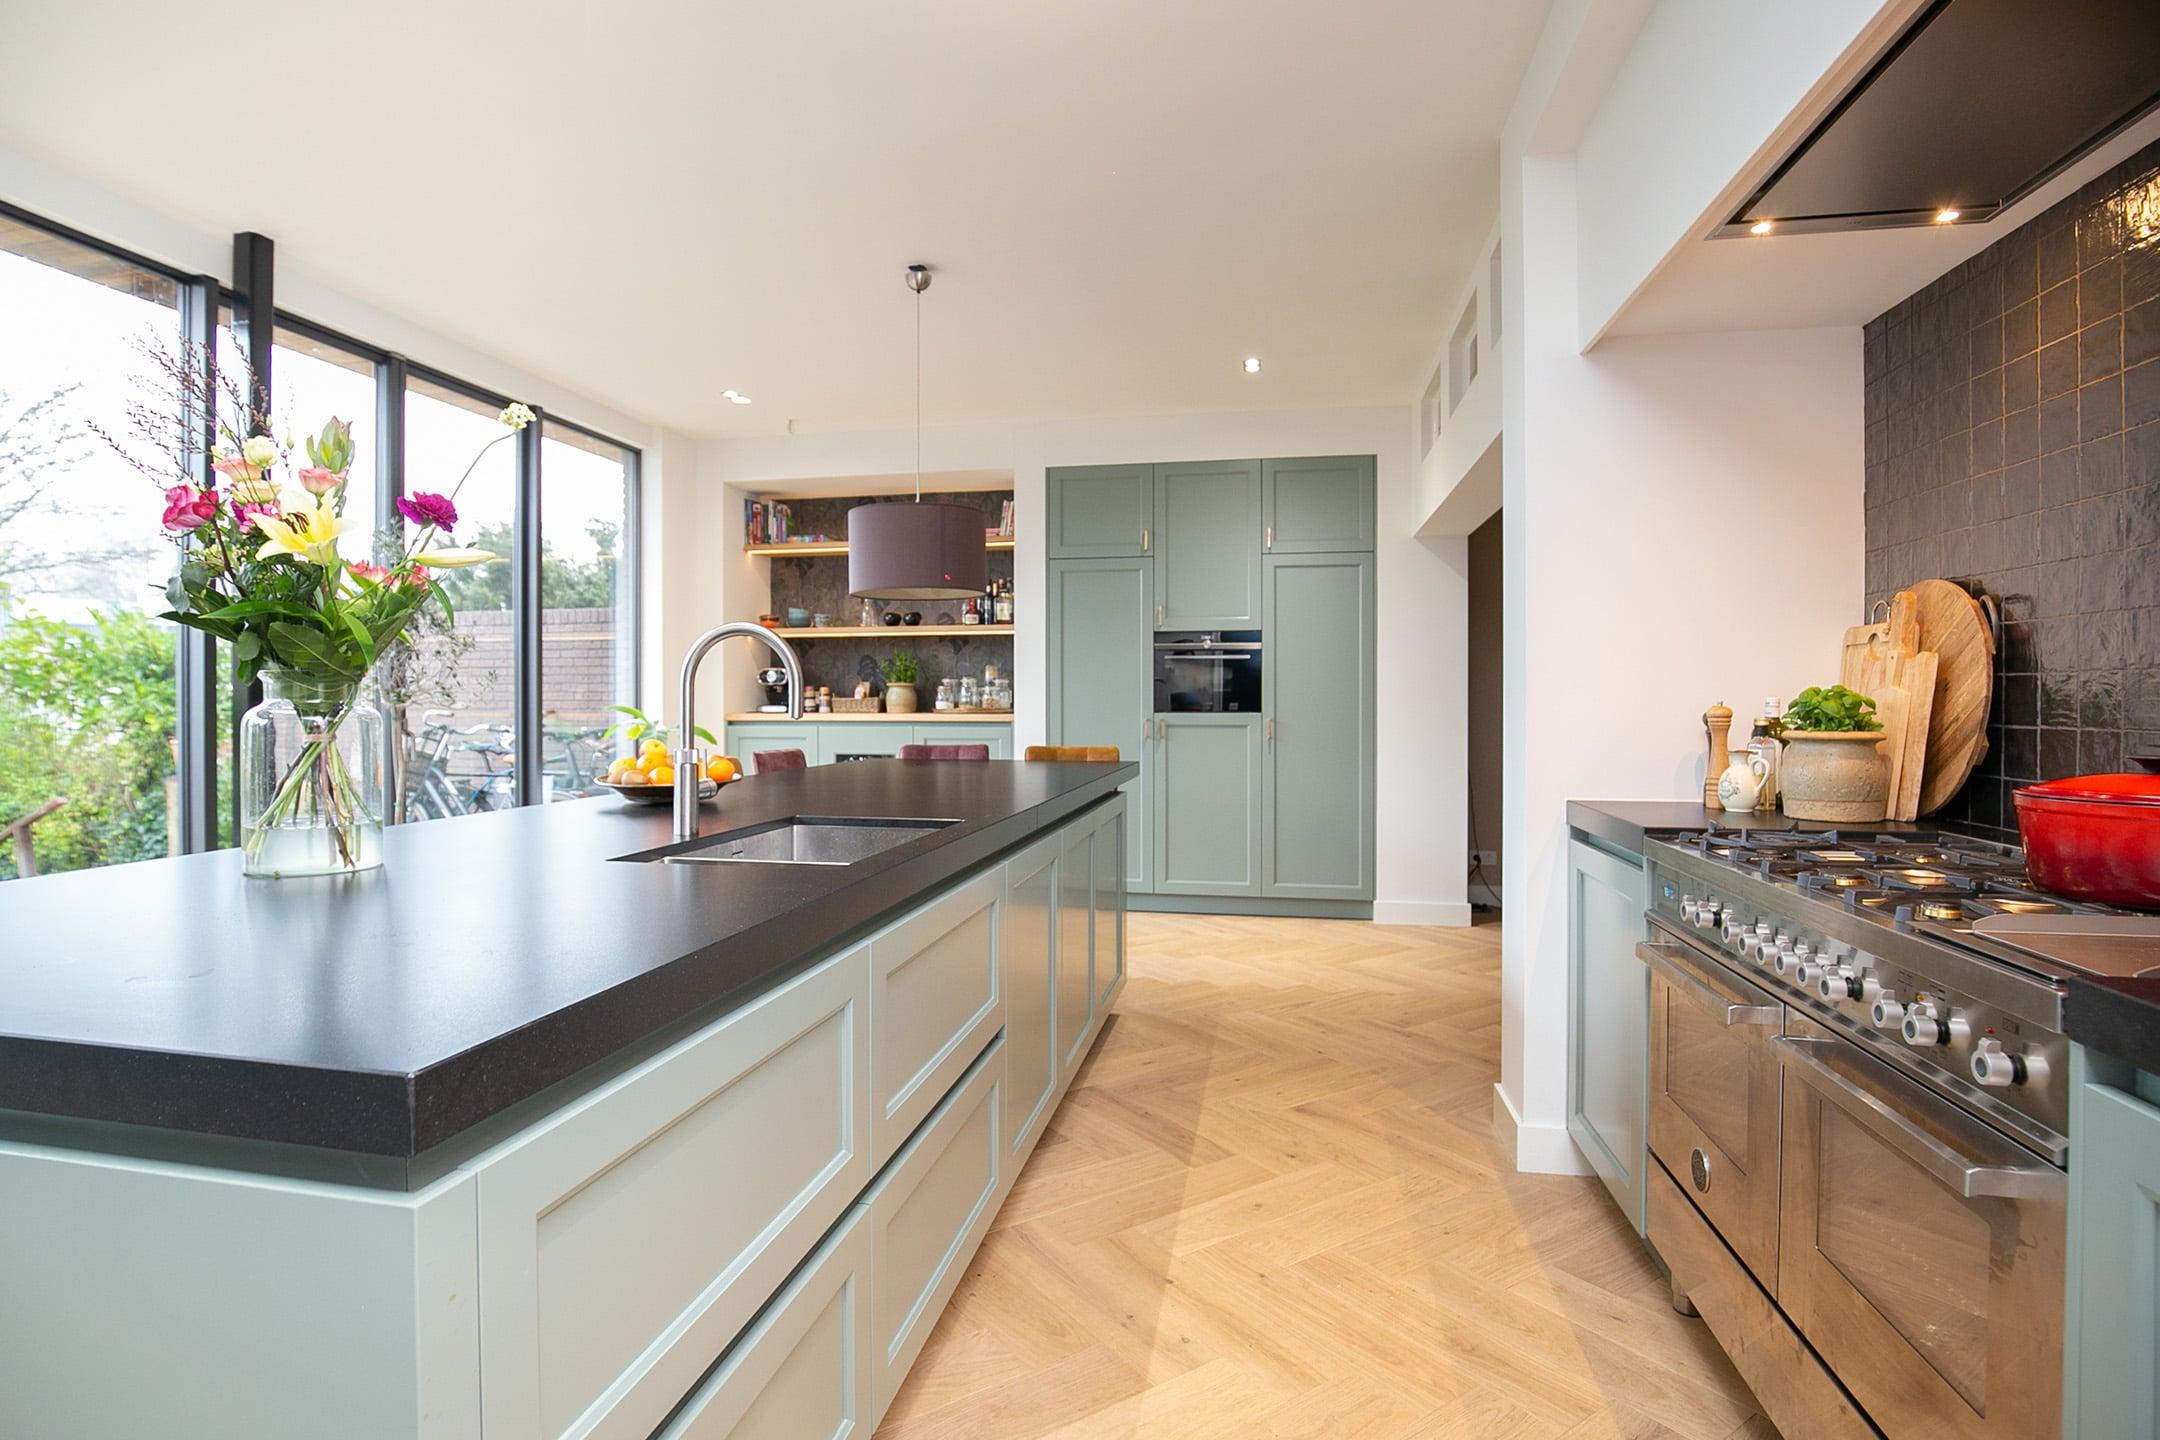 Keuken Den Bosch mat gelakt greeploos kaderfront